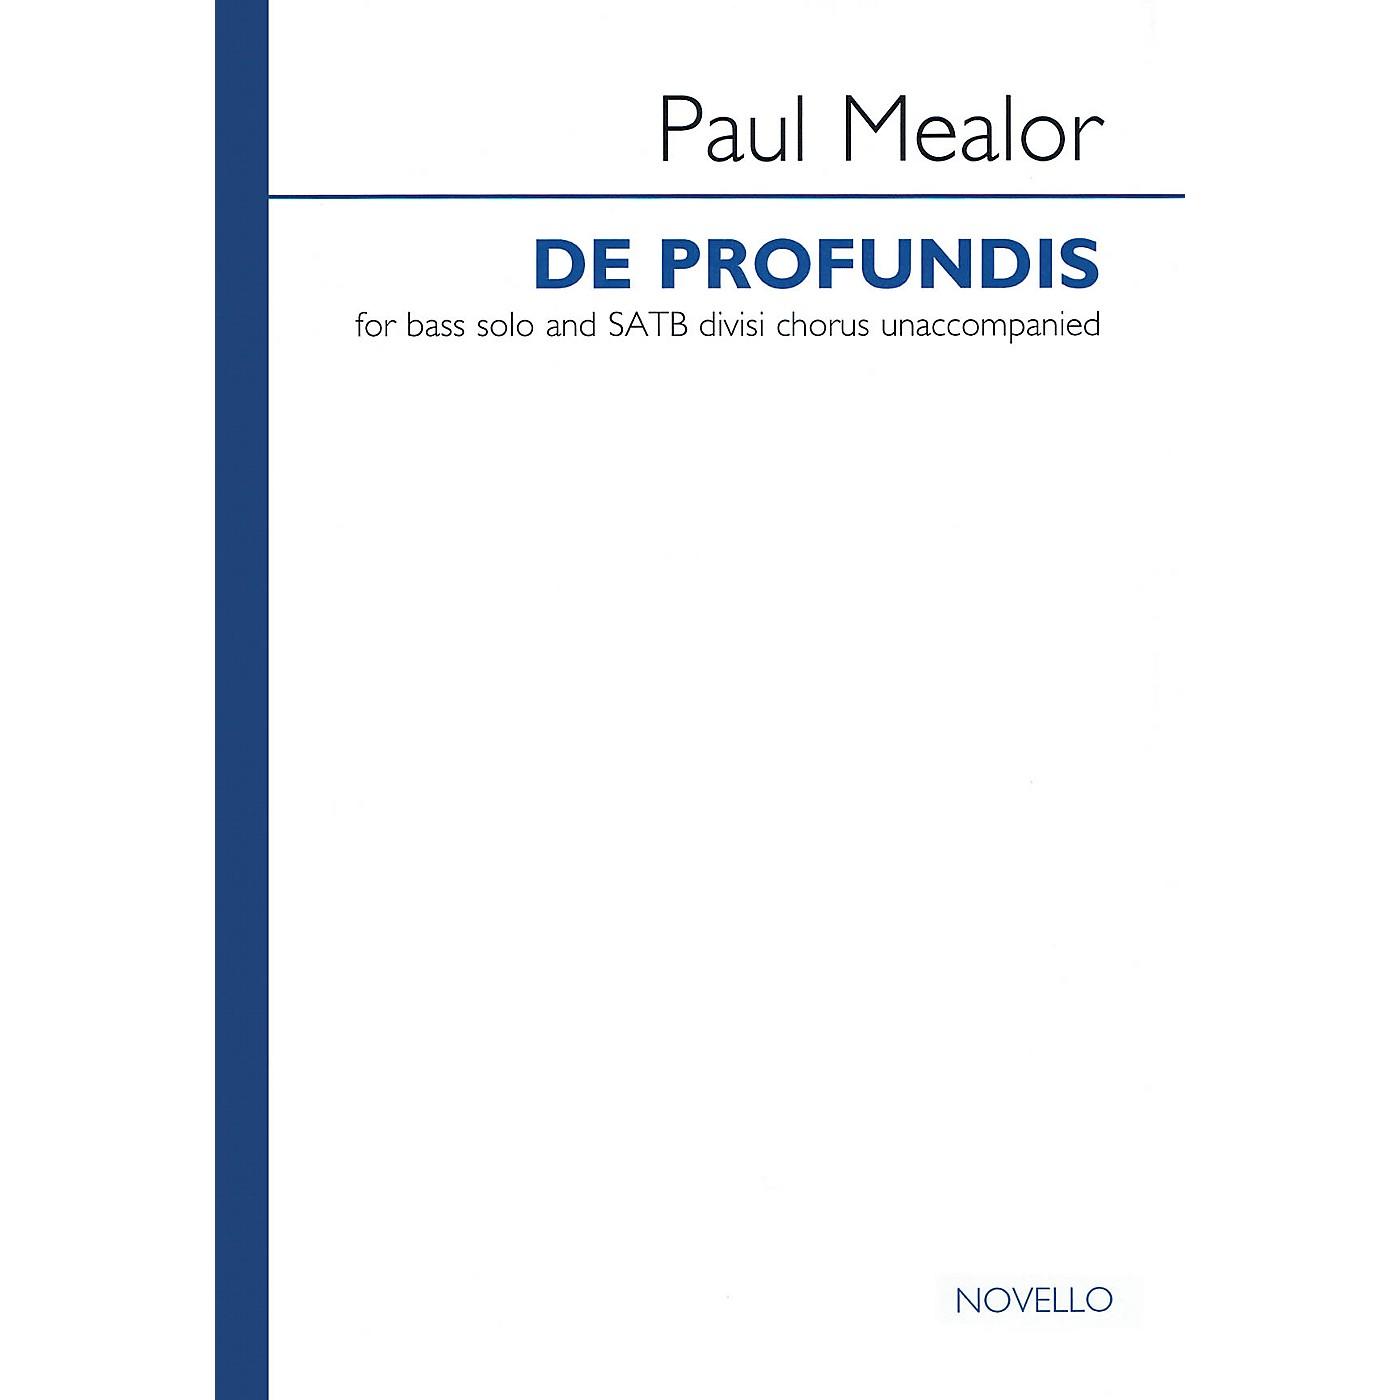 Novello De Profundis (for Bass Solo and SATB Divisi Chorus Unaccompanied) SATB DIVISI AND SOLO by Paul Mealor thumbnail